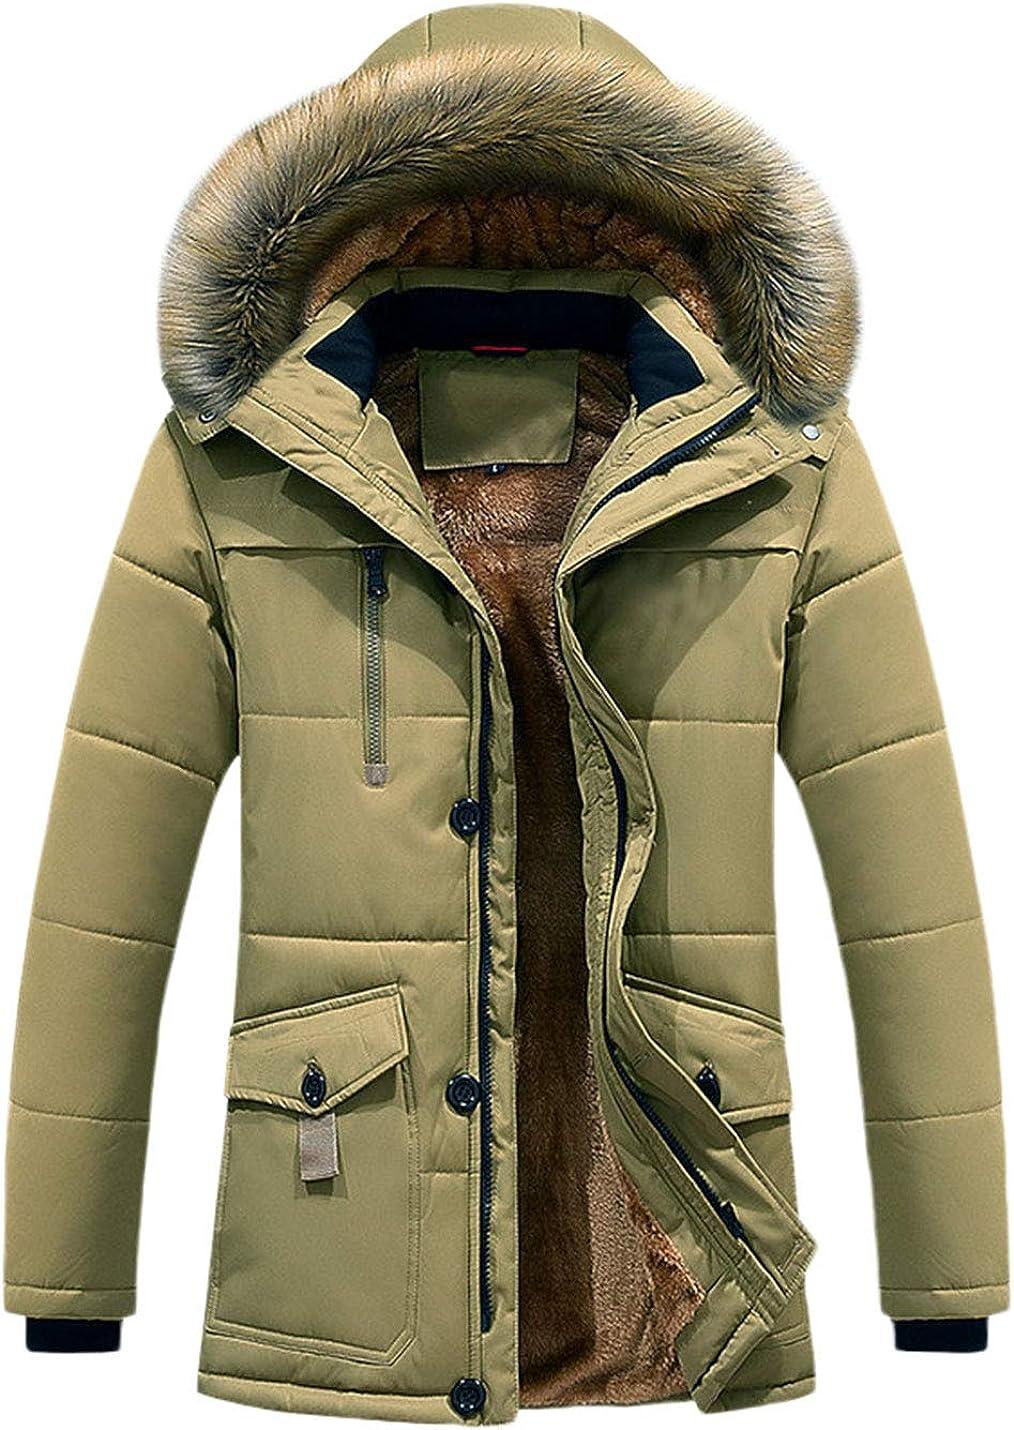 Omoone Men's Loose Faux Fur Hooded Fleece Lined Padded Snow Jacket Coat Parka